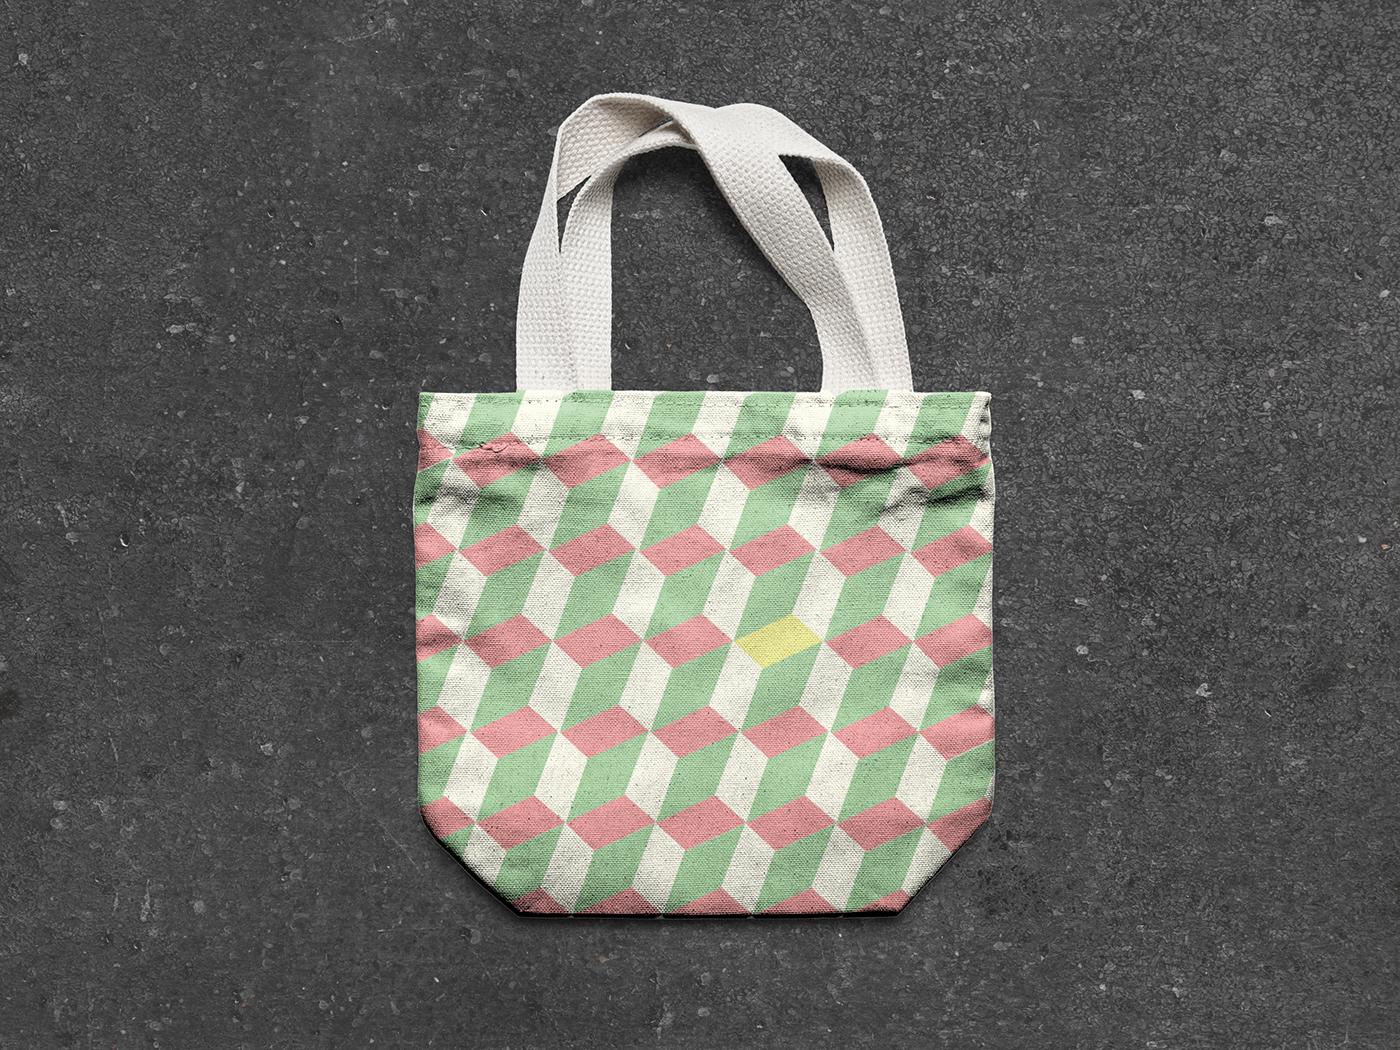 pattern design adobe creative color geometric adobeawards